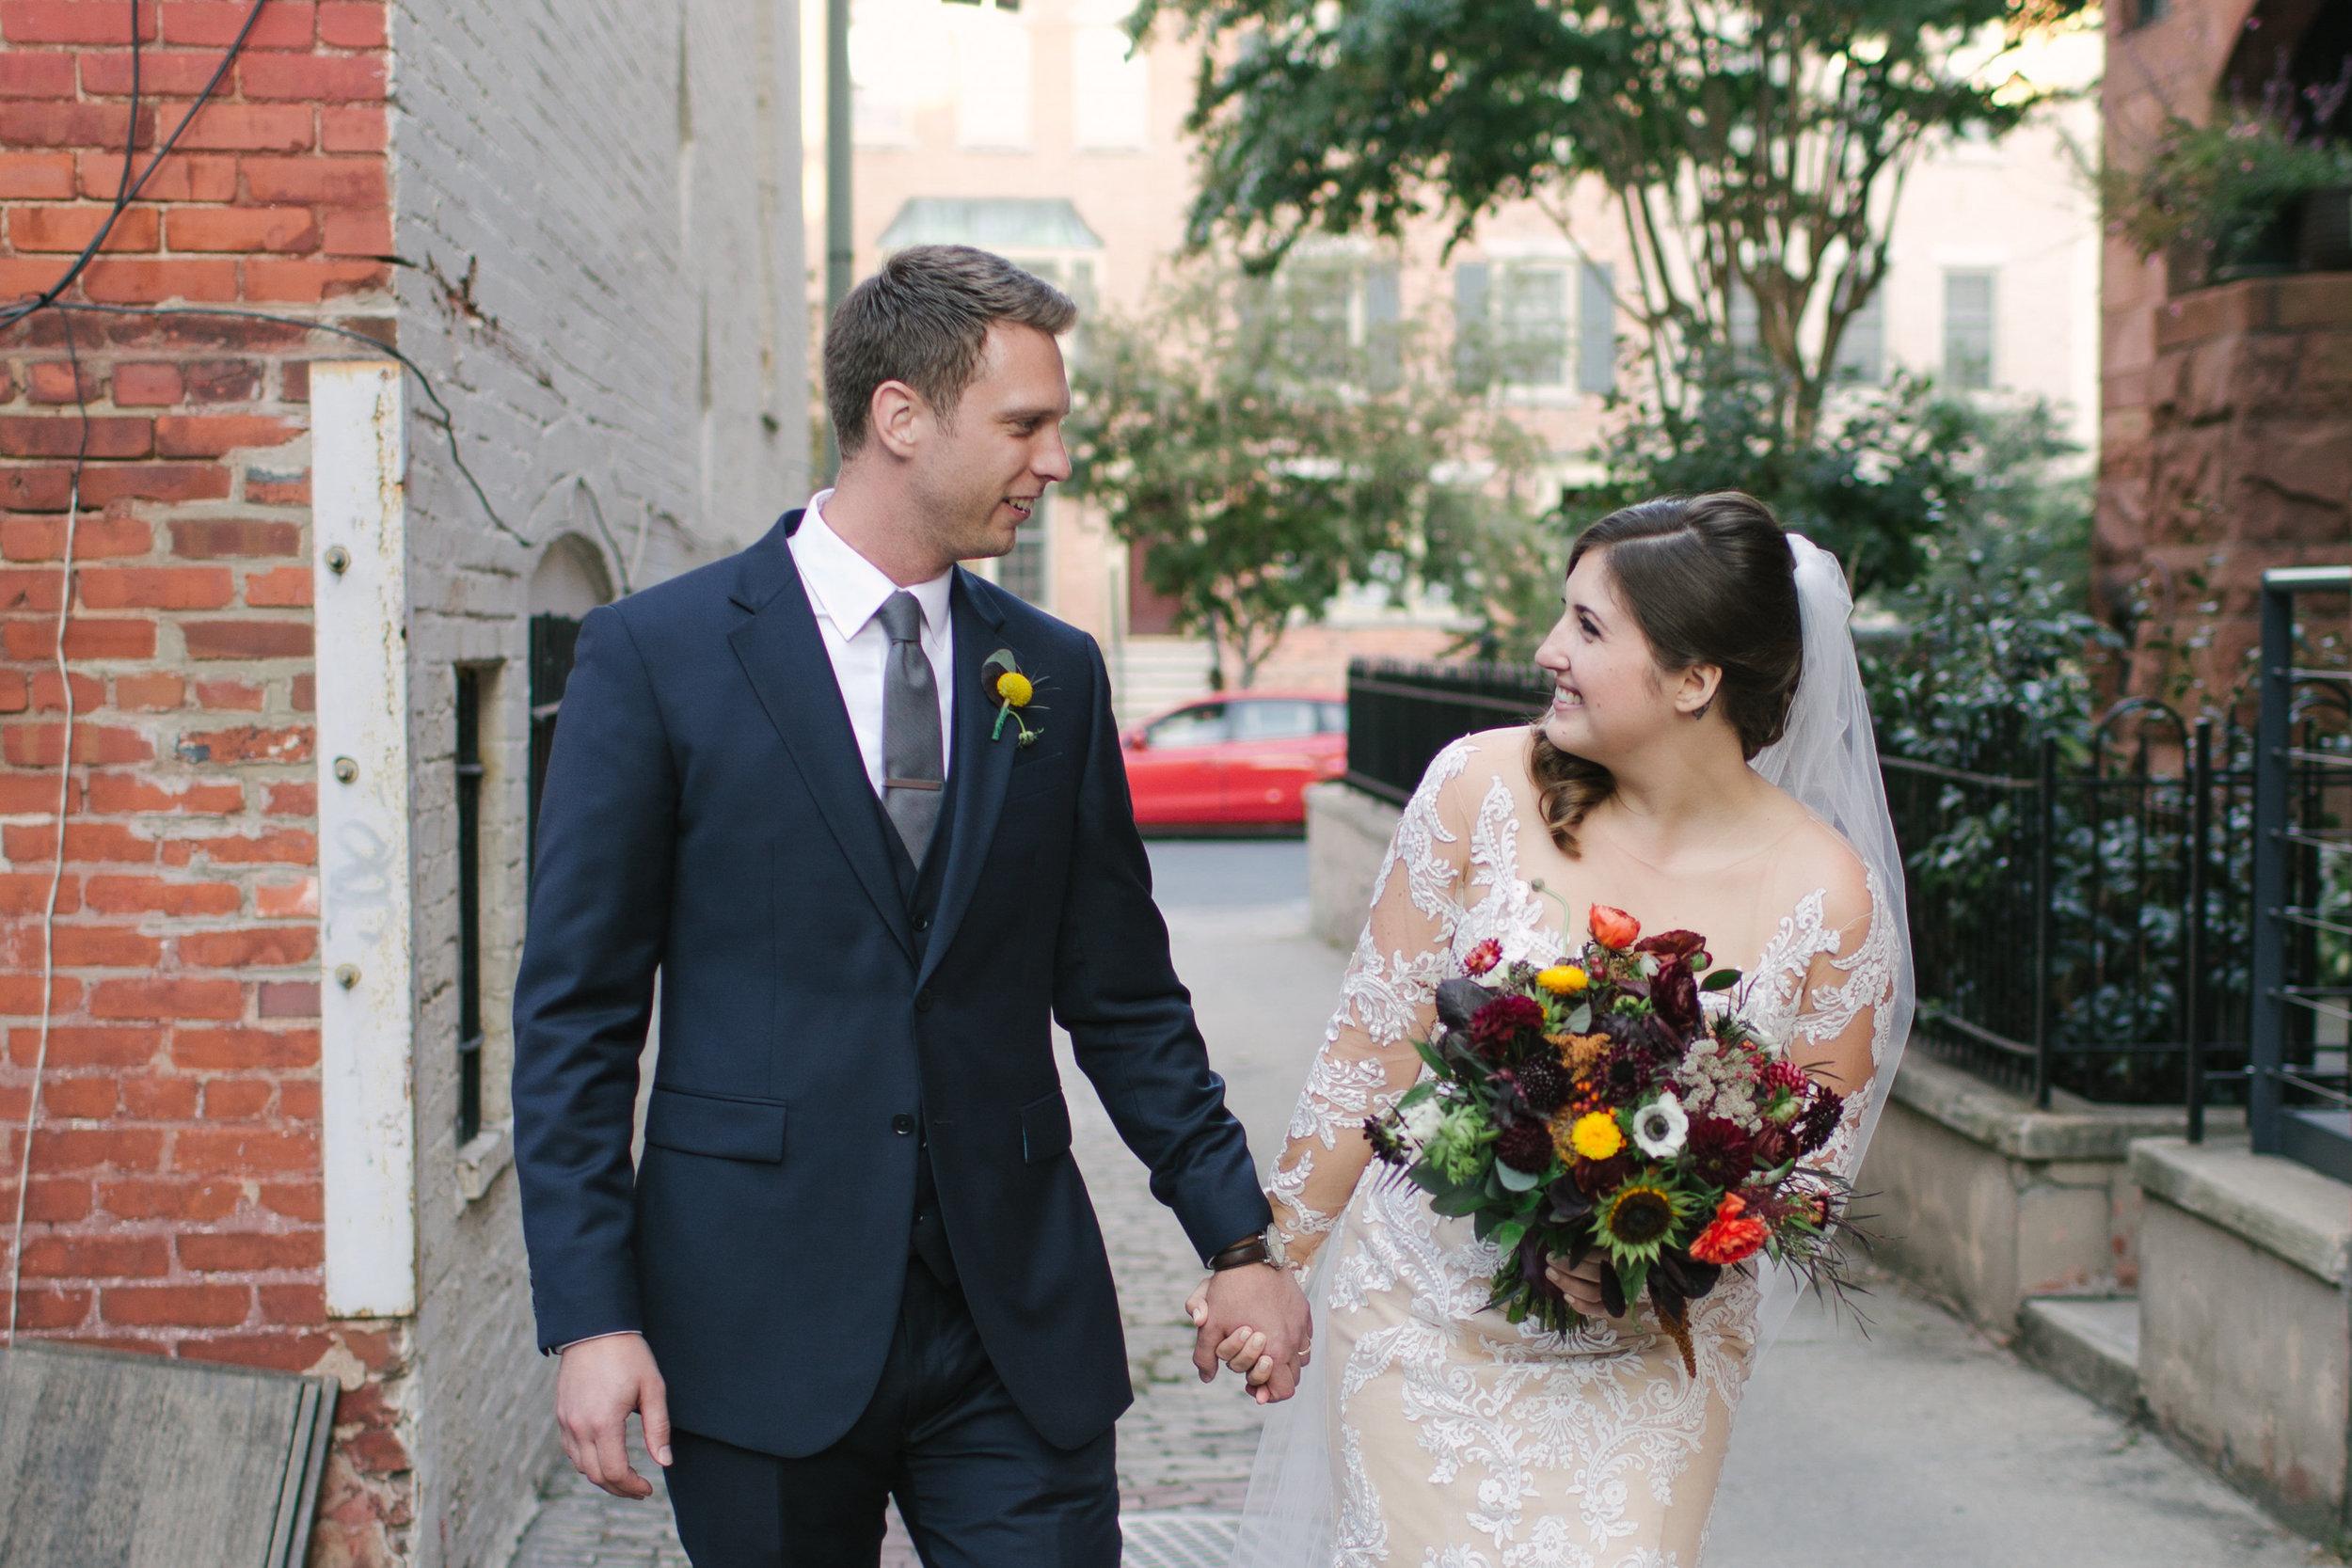 Dupon Circle Wedding | Washington DC Wedding Photography | Rebecca Wilcher Photography -16.jpg